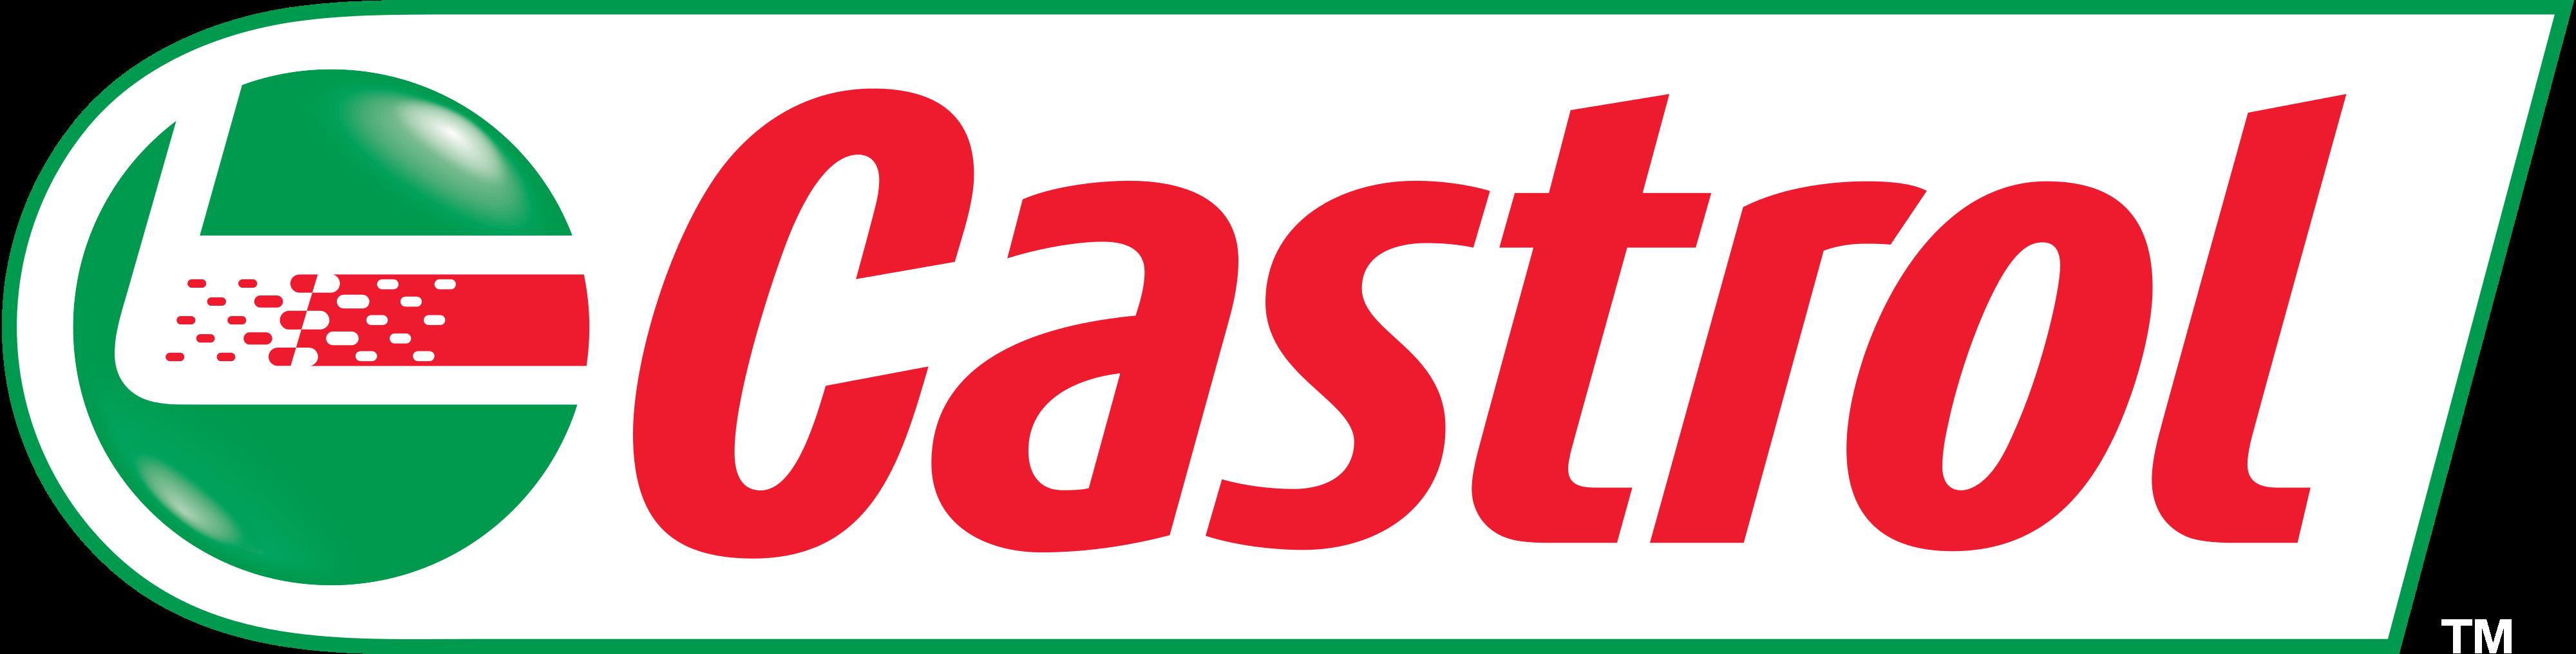 castrol logo - Castrol Logo